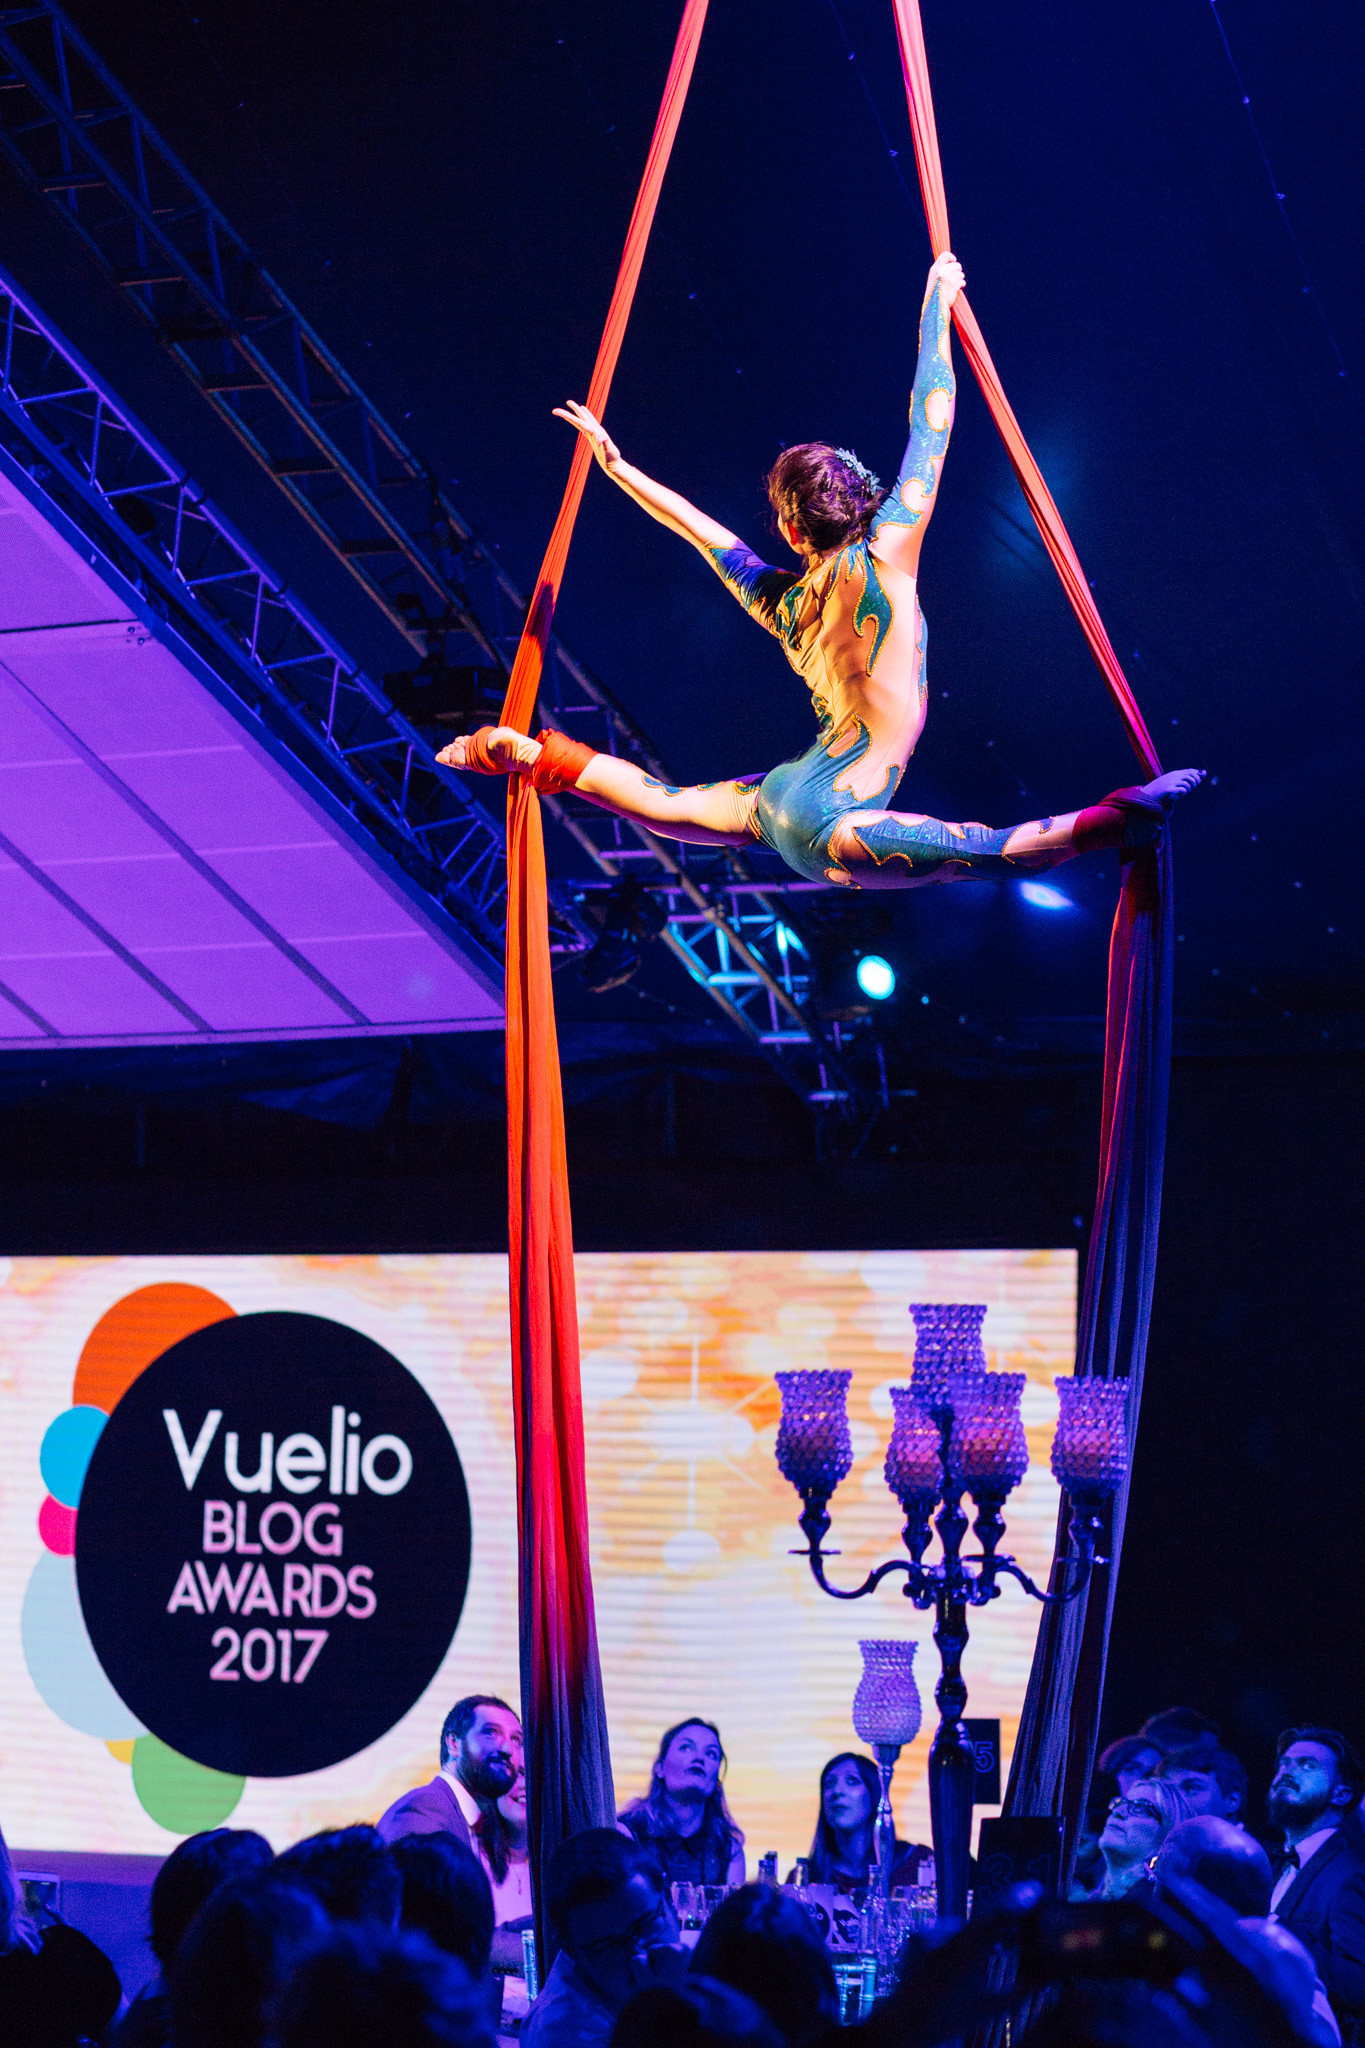 Vuelio Blog Awards photographed by Diana Novikova